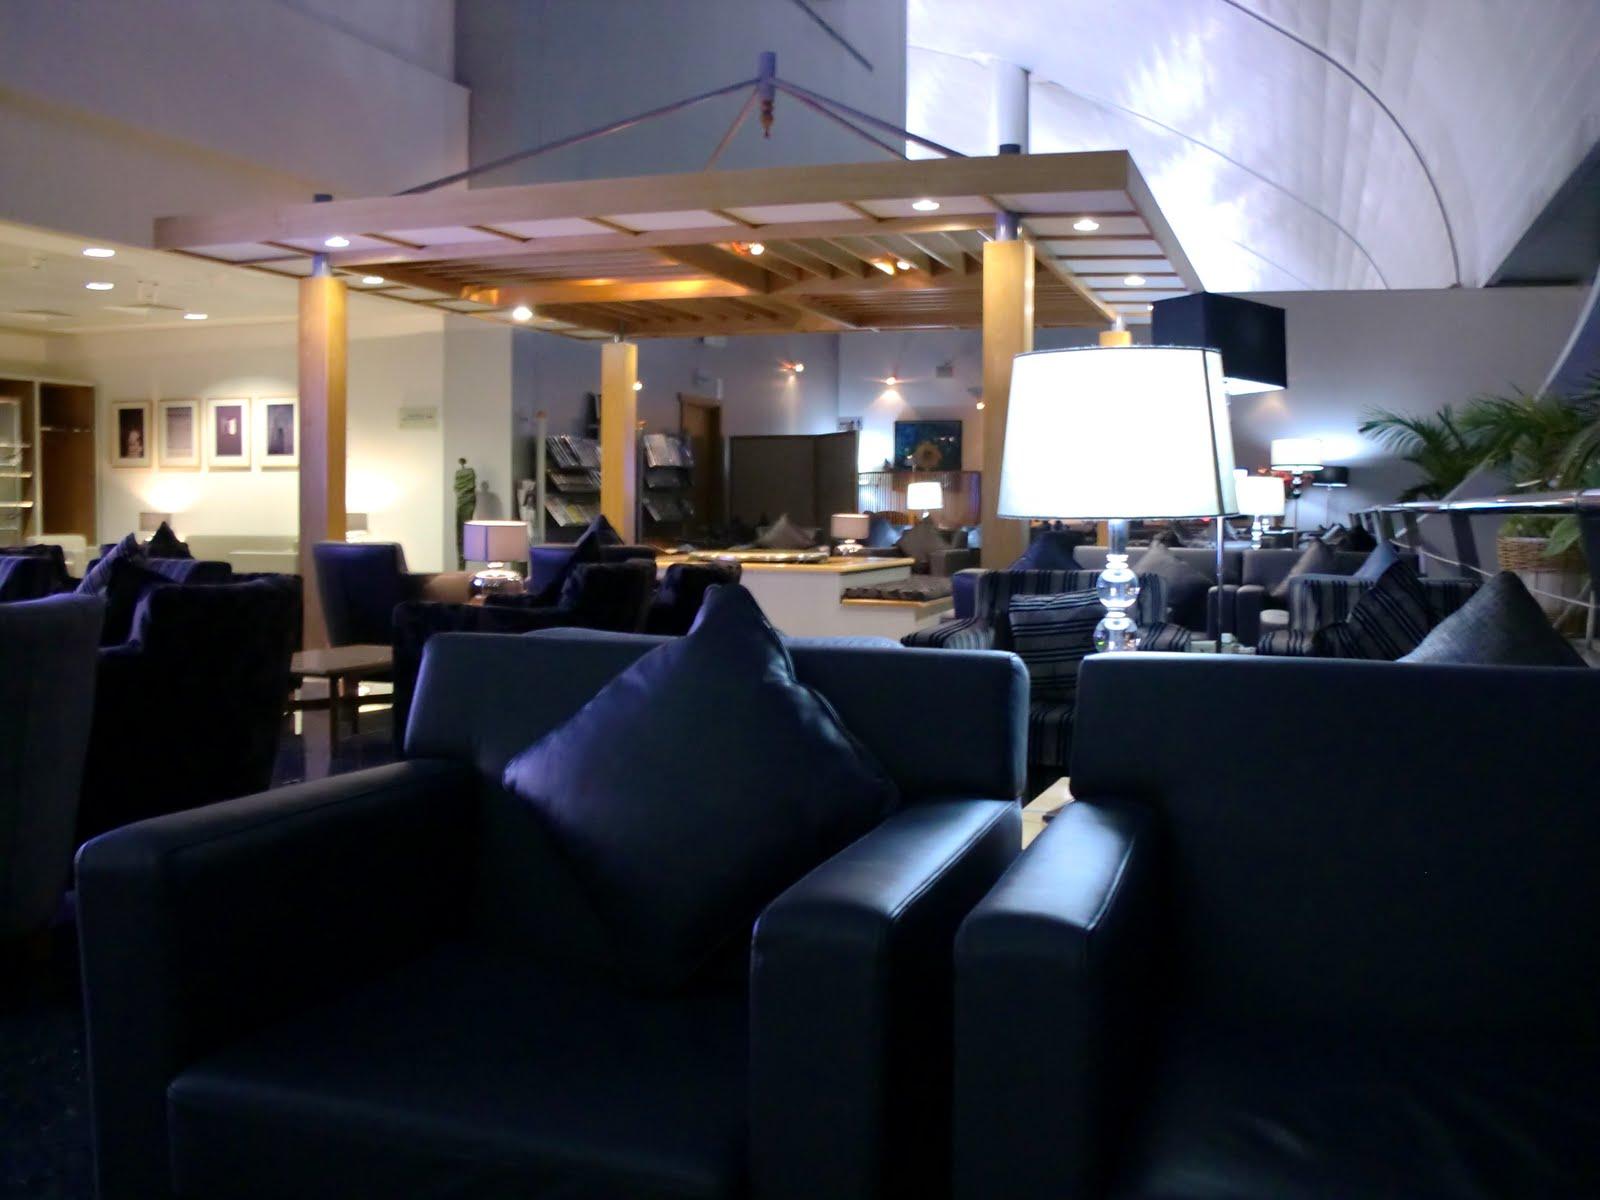 Skyteam Lounge Dubai ba Lounge Dubai by Ajo2106